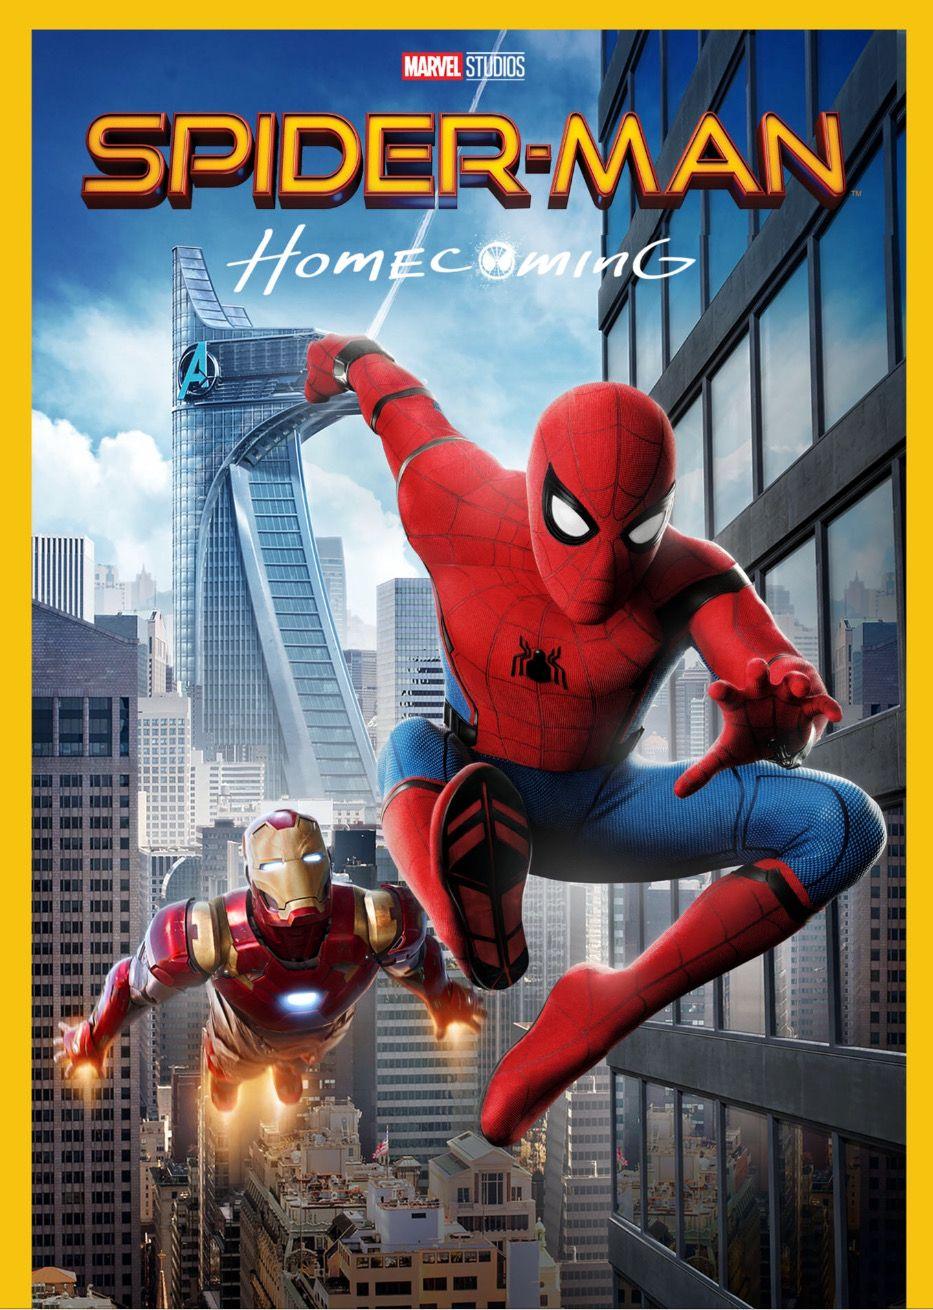 Spider Man Homecoming Vf Streaming : spider, homecoming, streaming, Ventas, Tradiciones, Colombianas, Relojes, Pared, Spiderman,, Spider, Homecoming, 2017,, Movies, Online